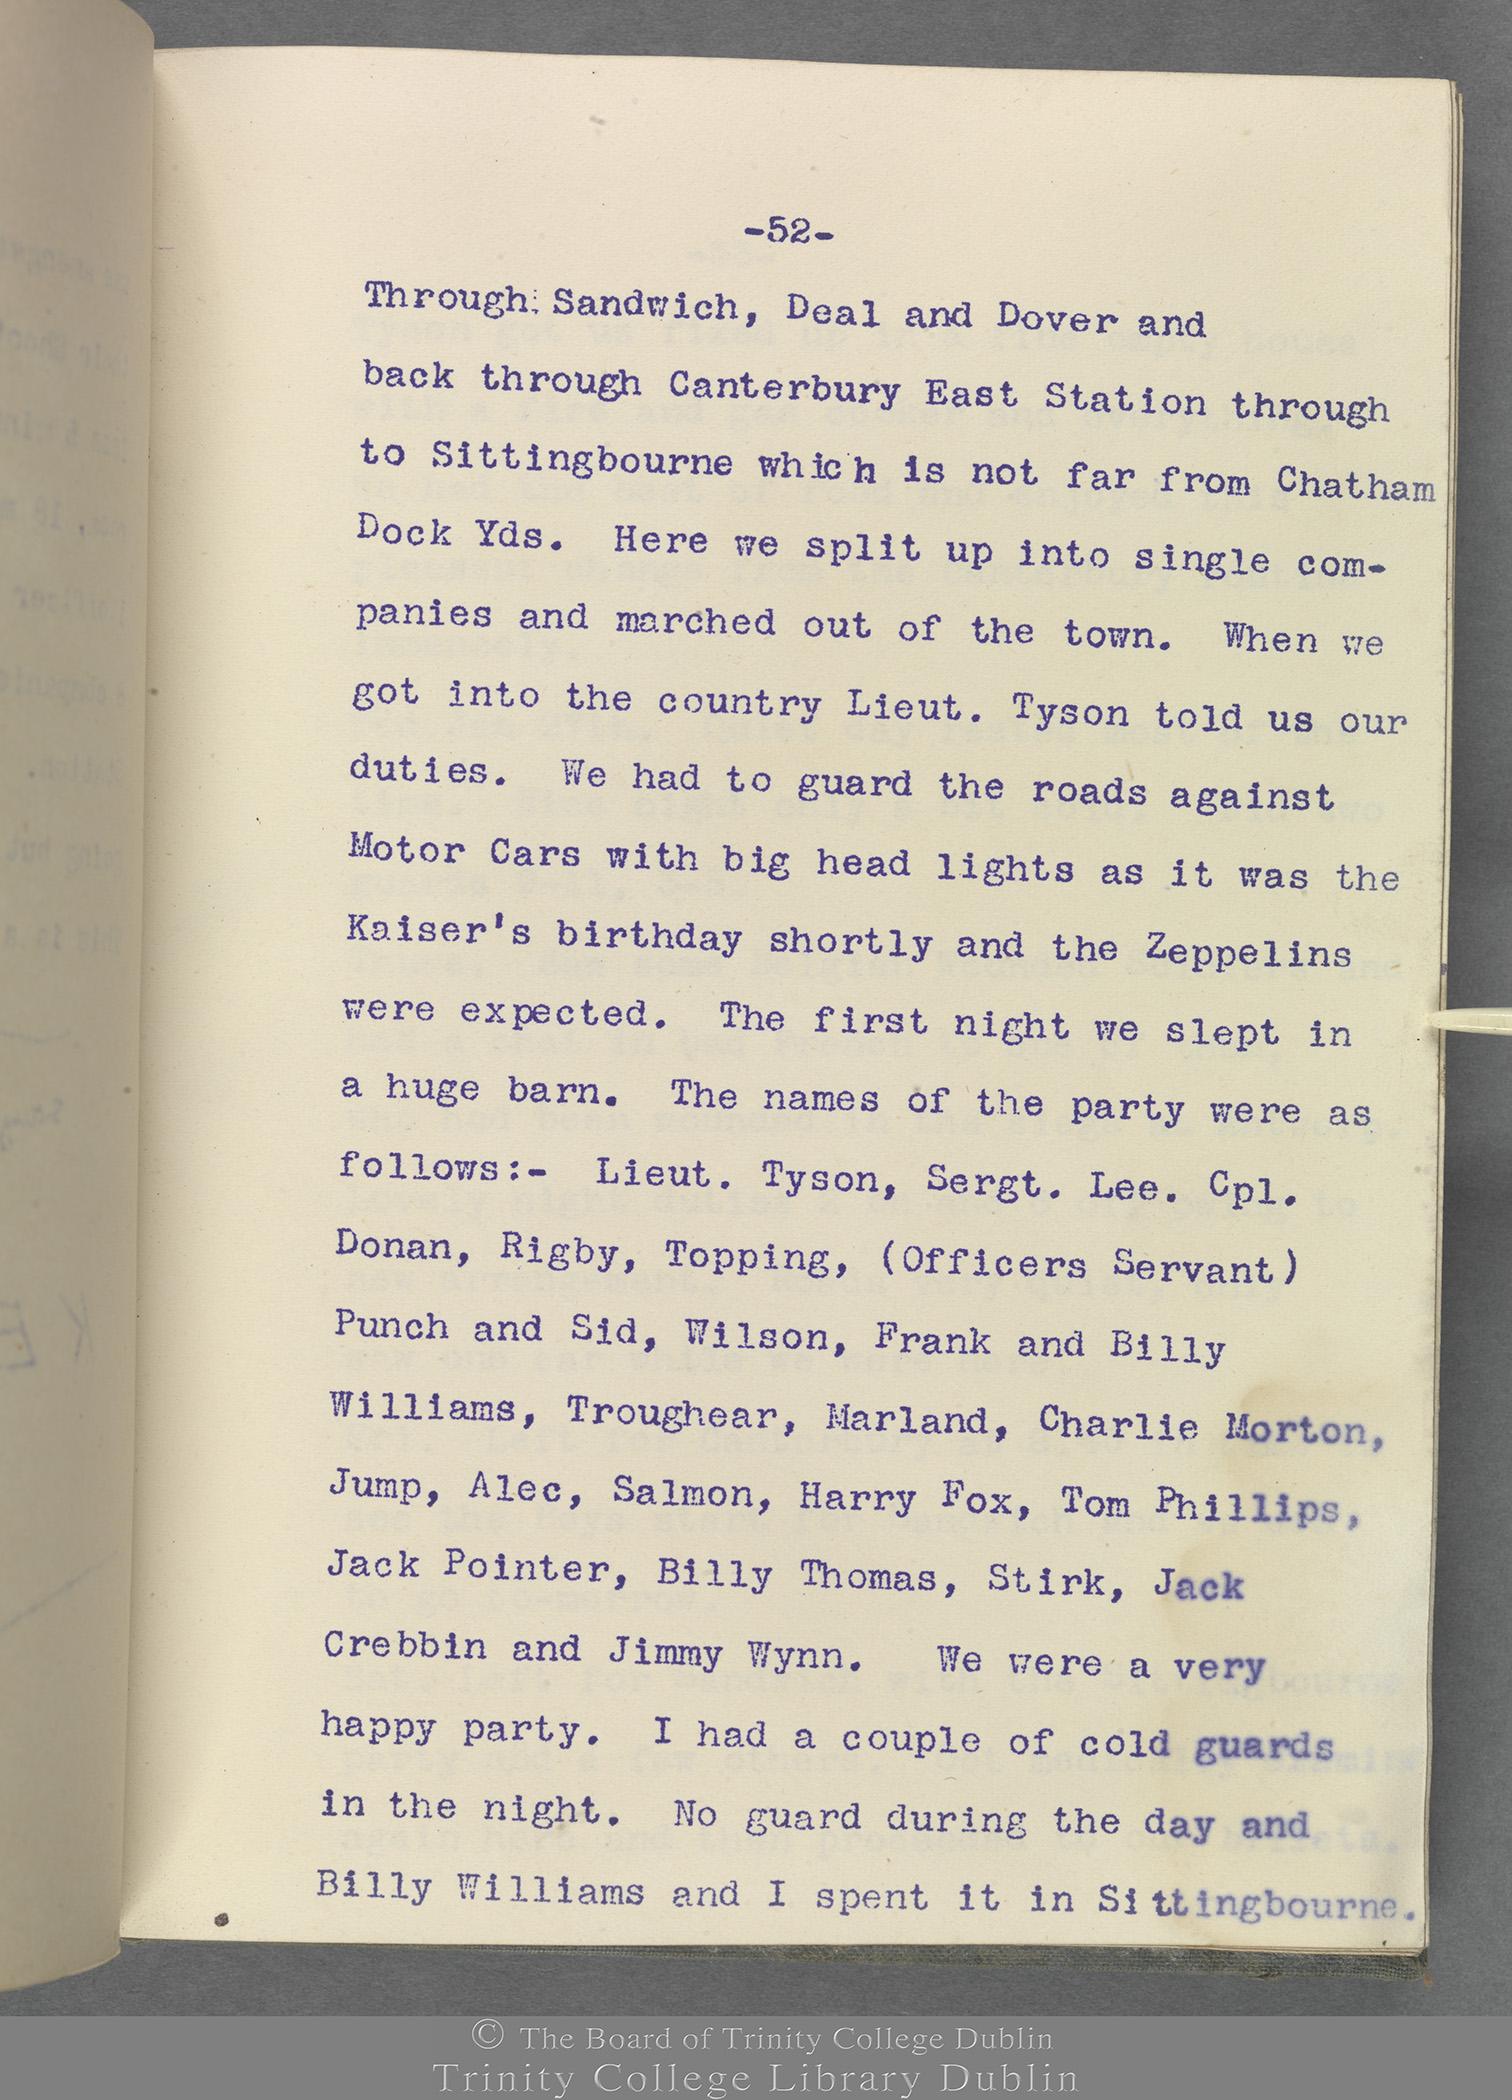 TCD MS 10853 folio 52 recto